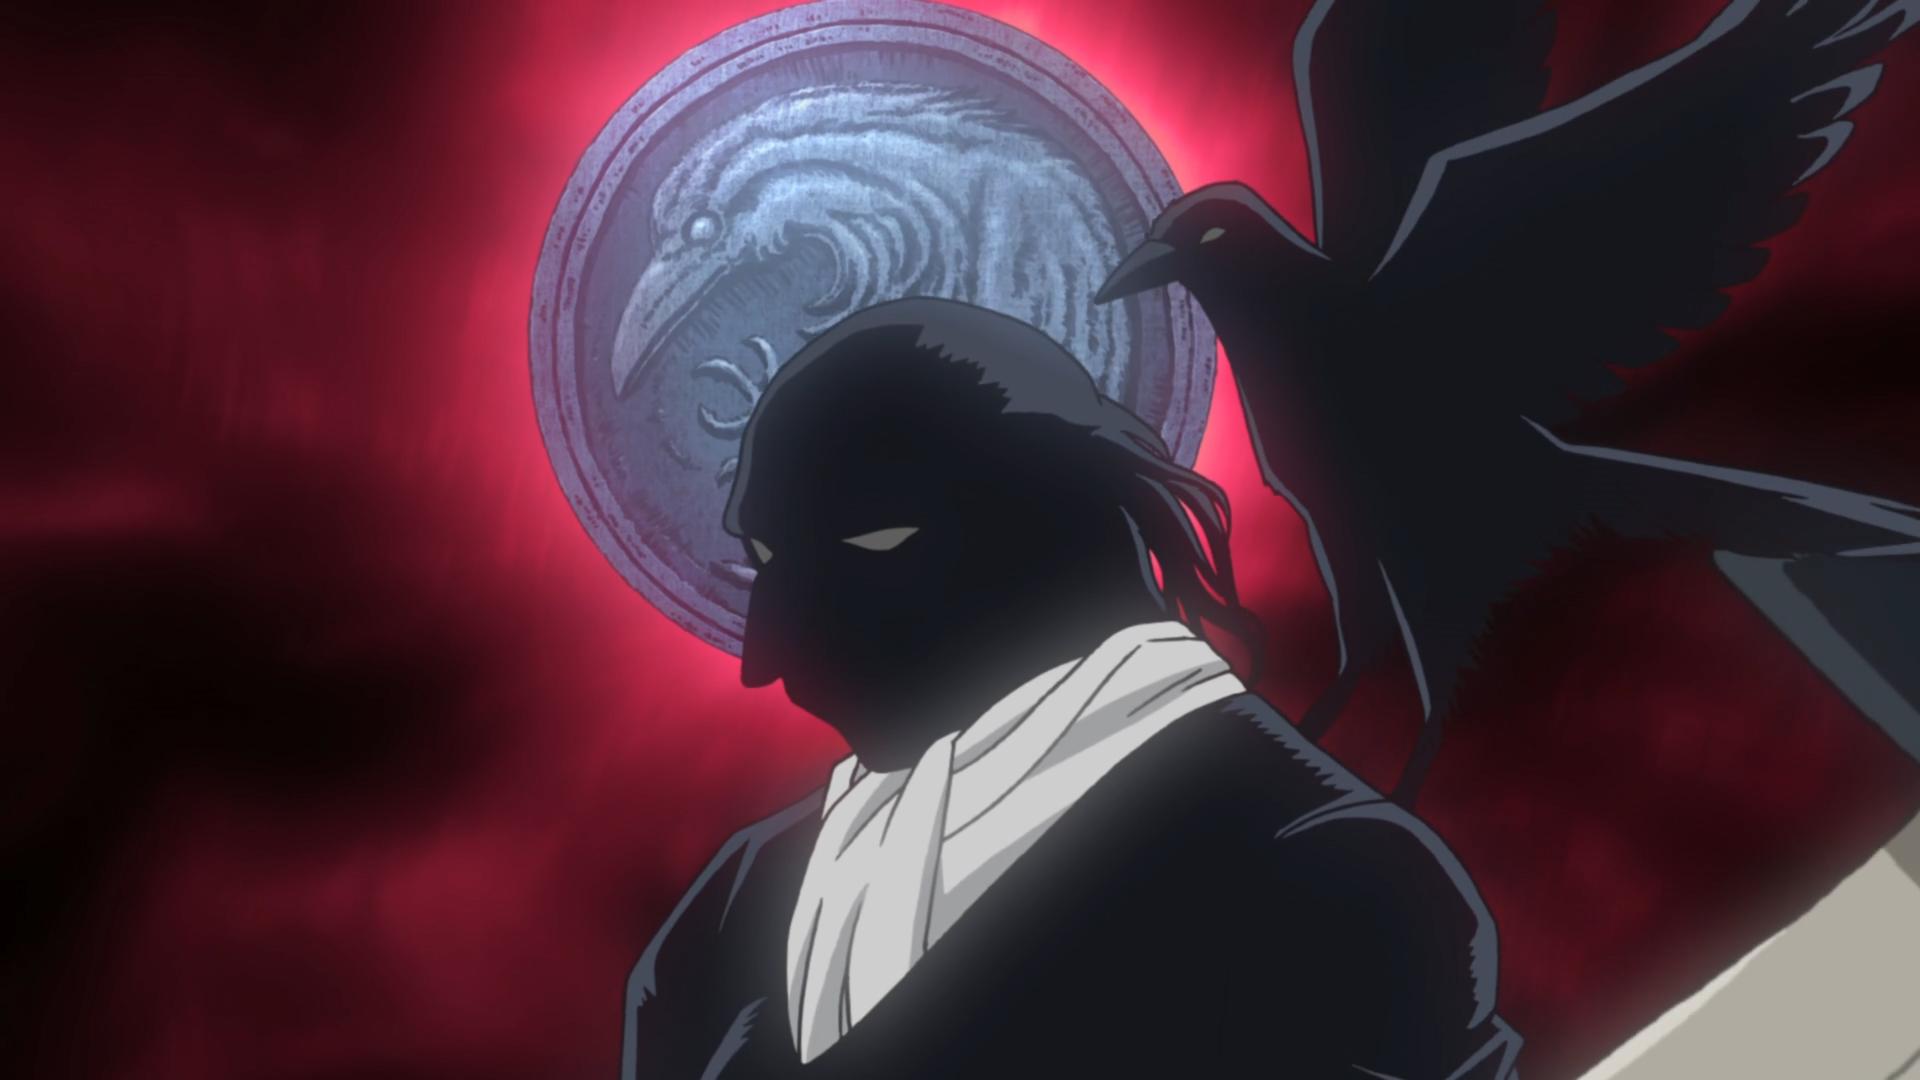 Renya Karasuma | Detective Conan Wiki | FANDOM powered by Wikia